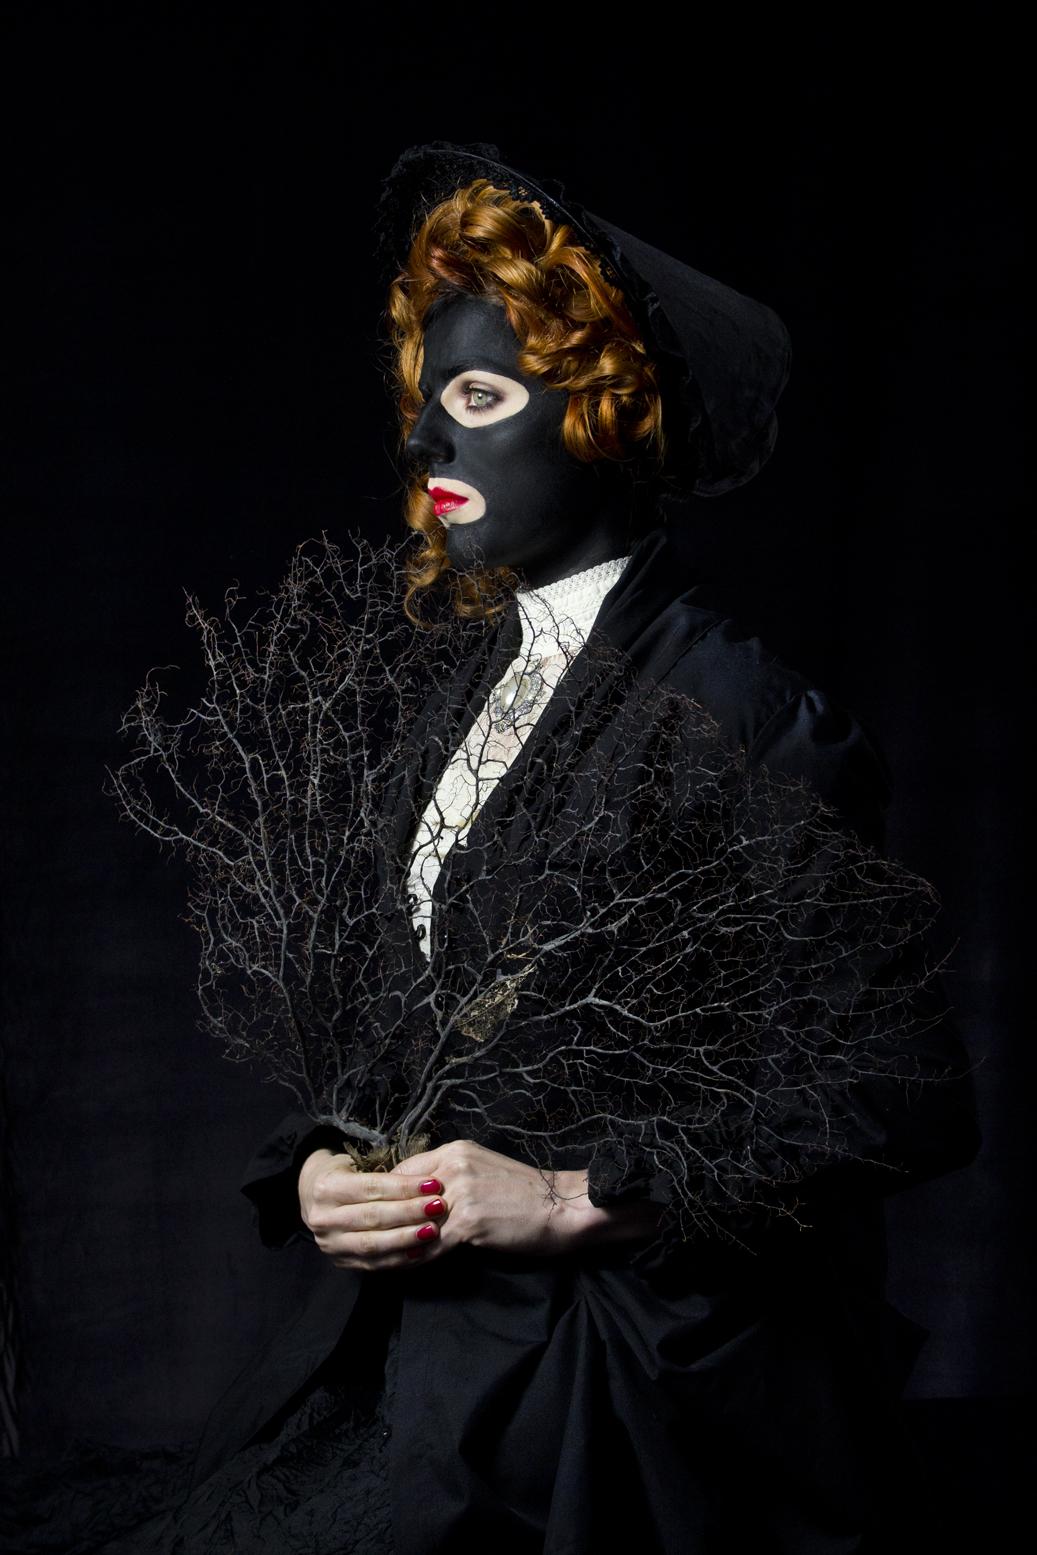 Simon Fowler - Portraits